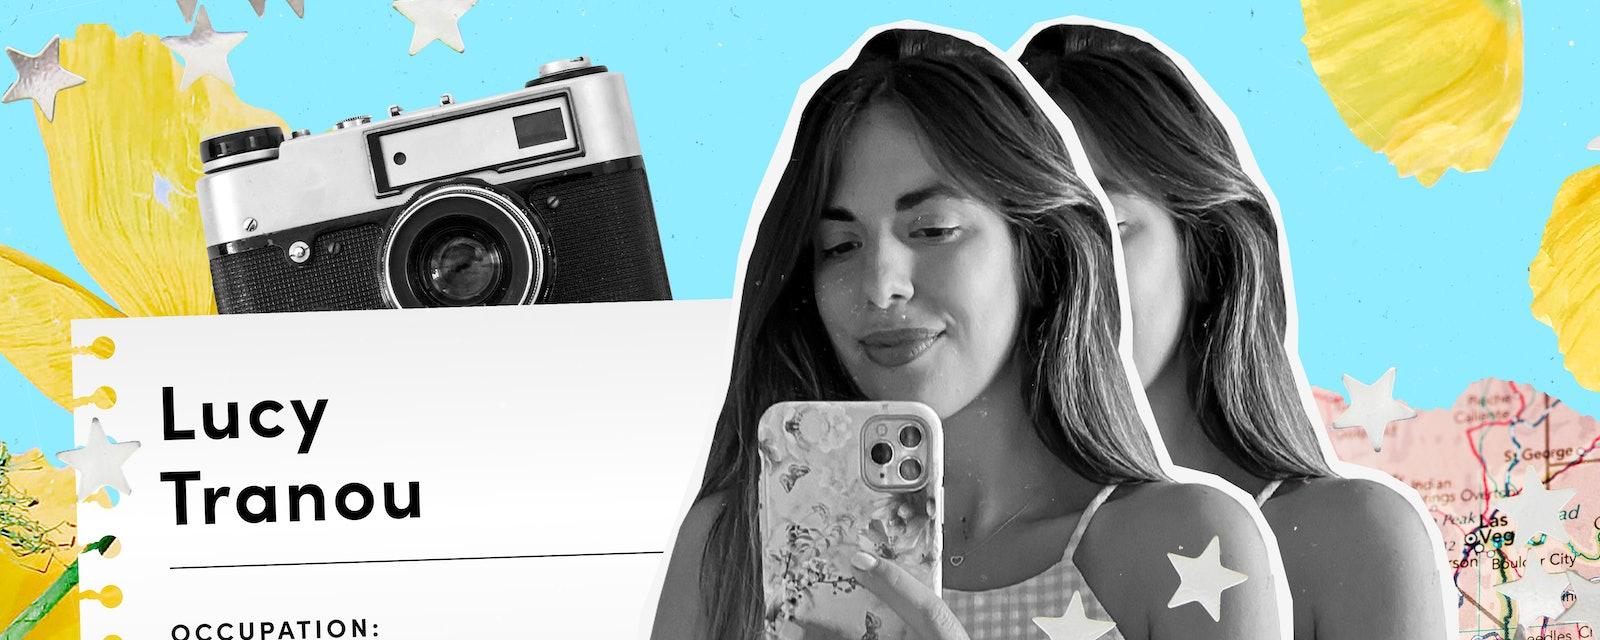 A woman wearing a checkered tank top takes a selfie.